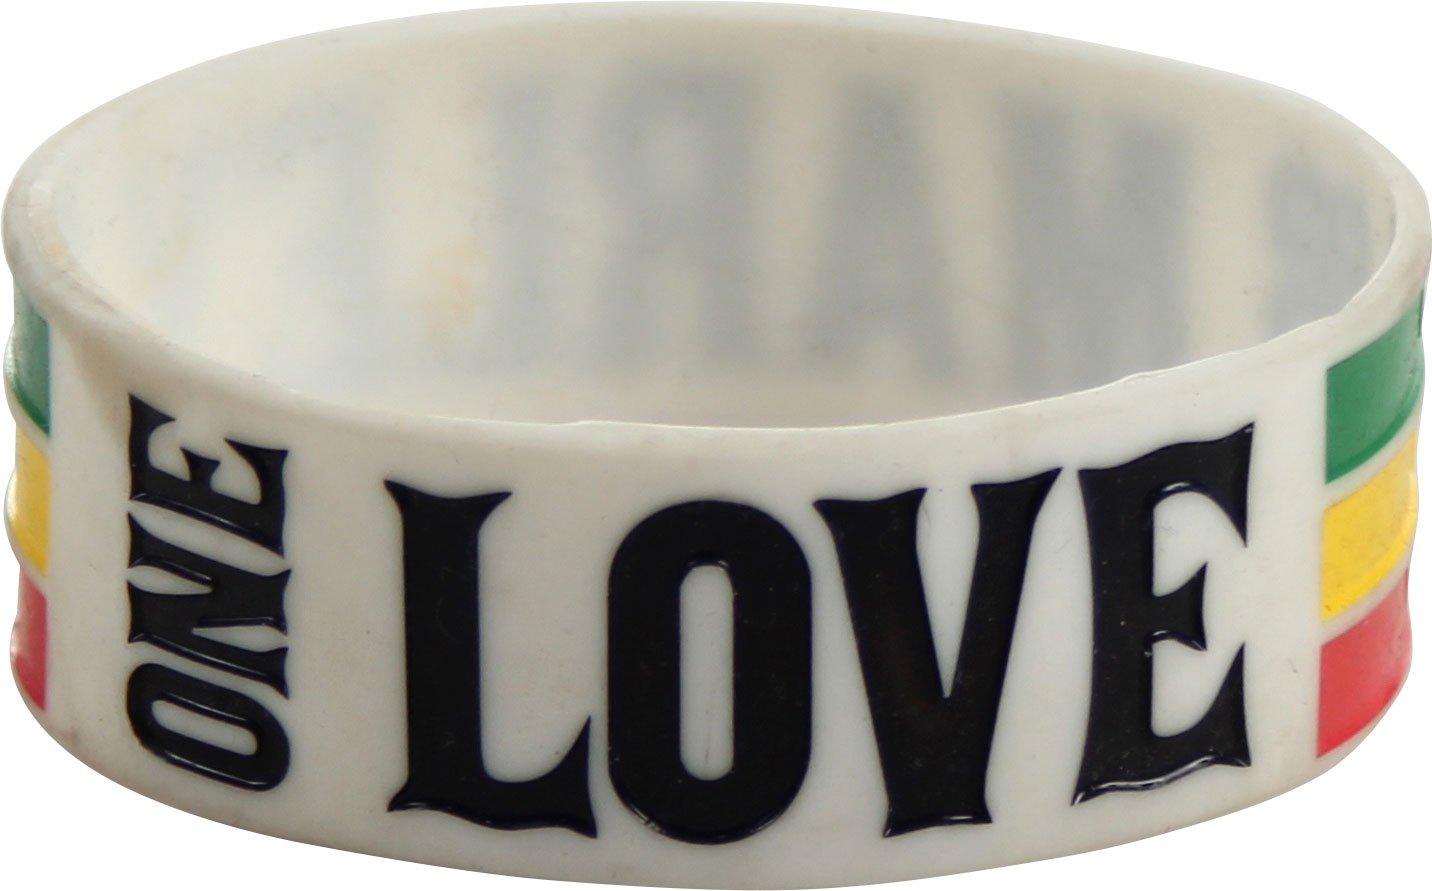 Bob Marley - One Love Silicone Wristband Wristband In White, O/S, White